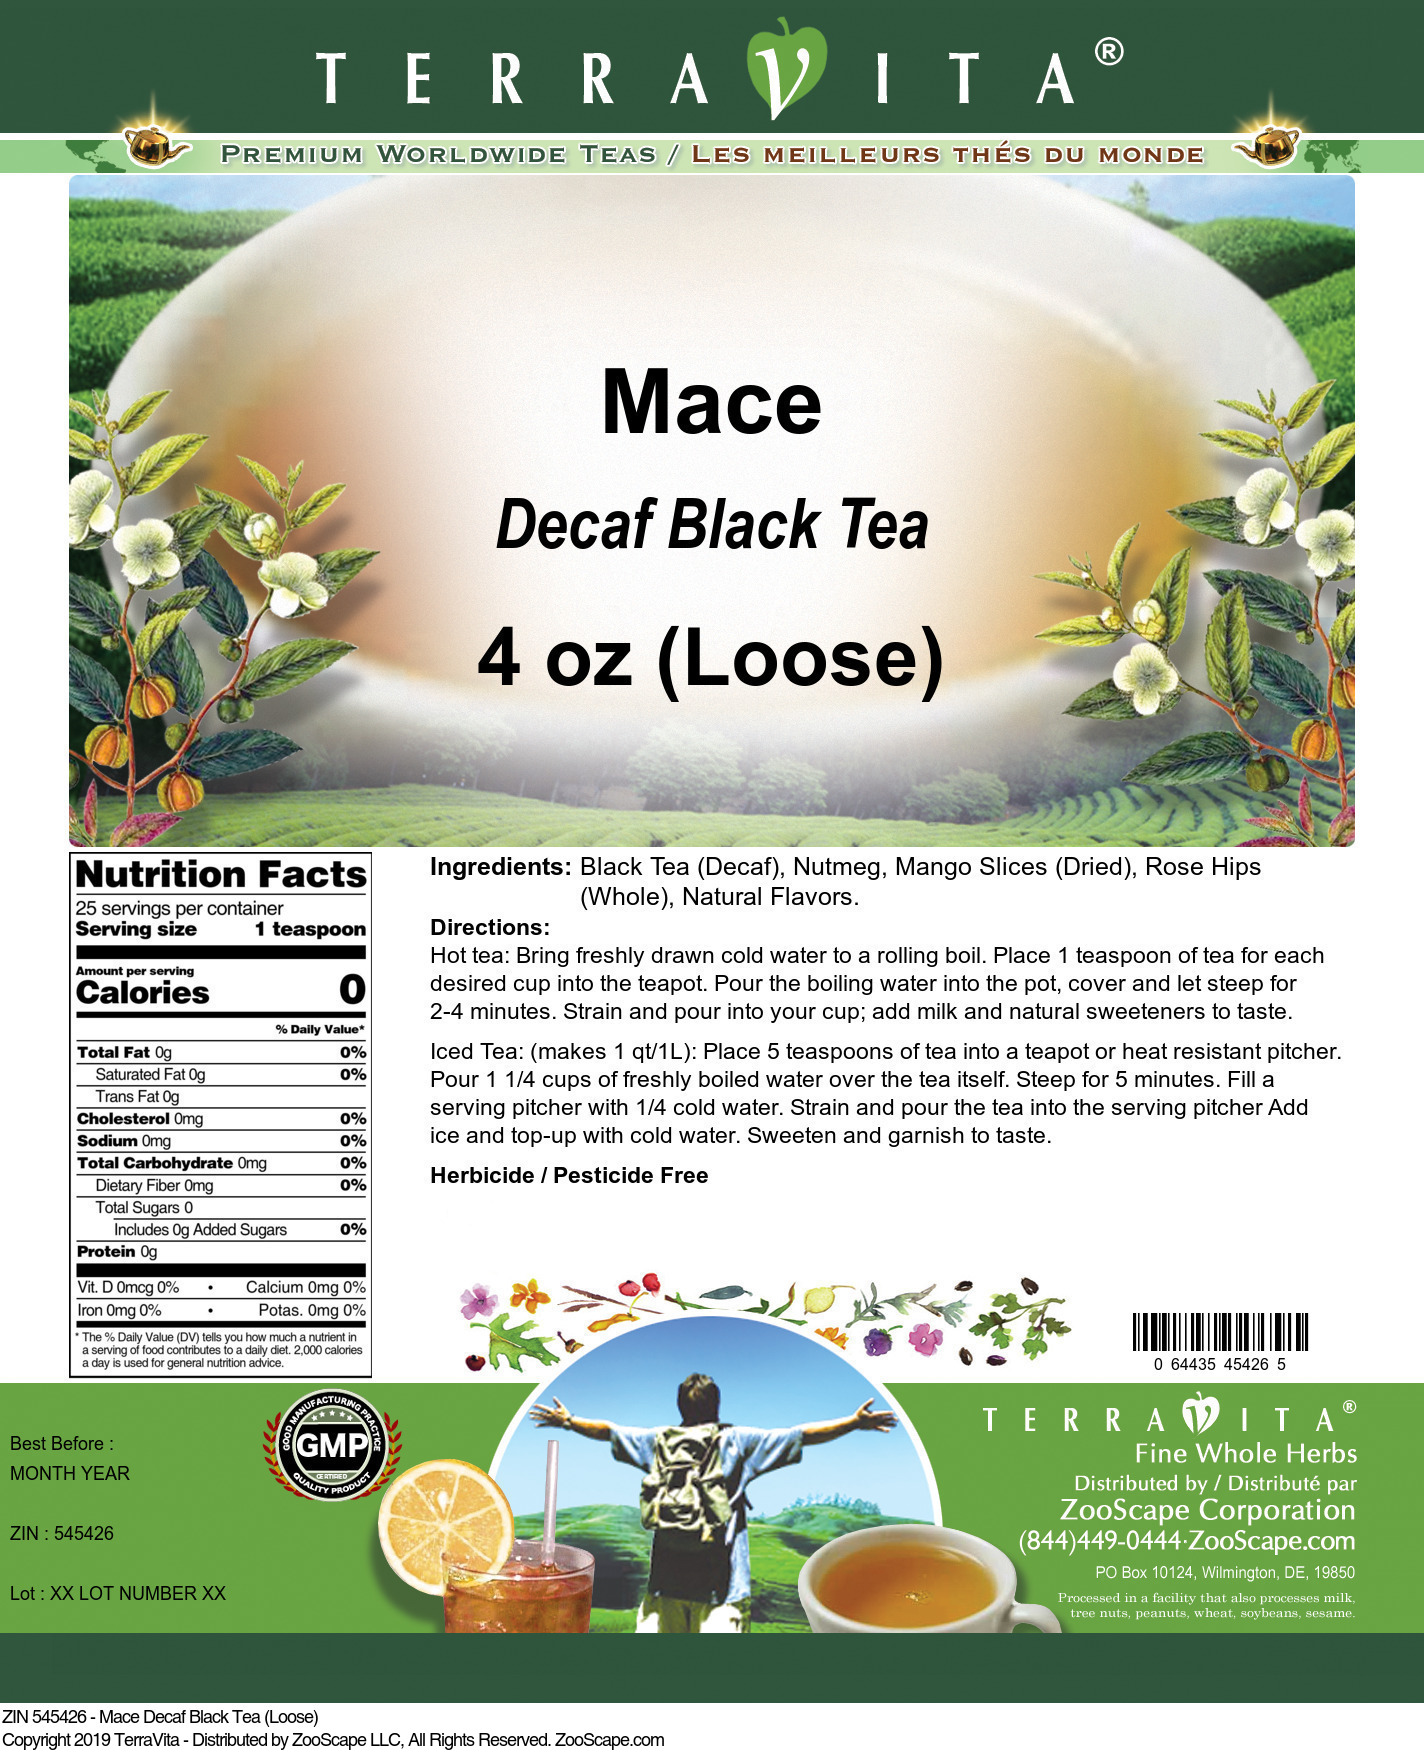 Mace Decaf Black Tea